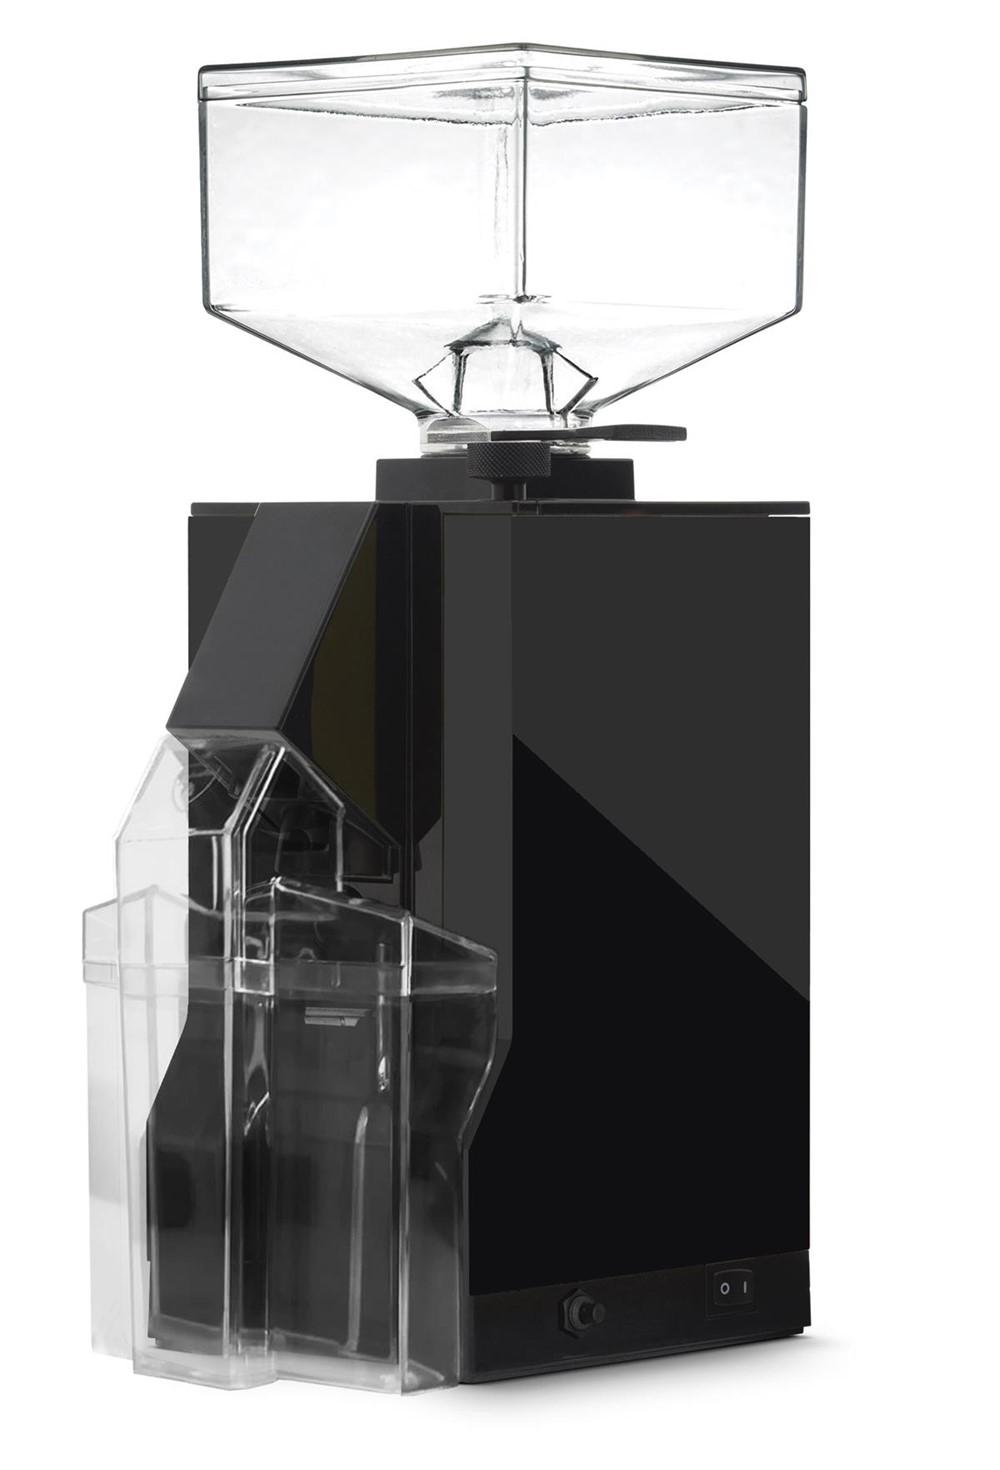 Eureka Filtro 15 BL schwarz Kaffeemühle